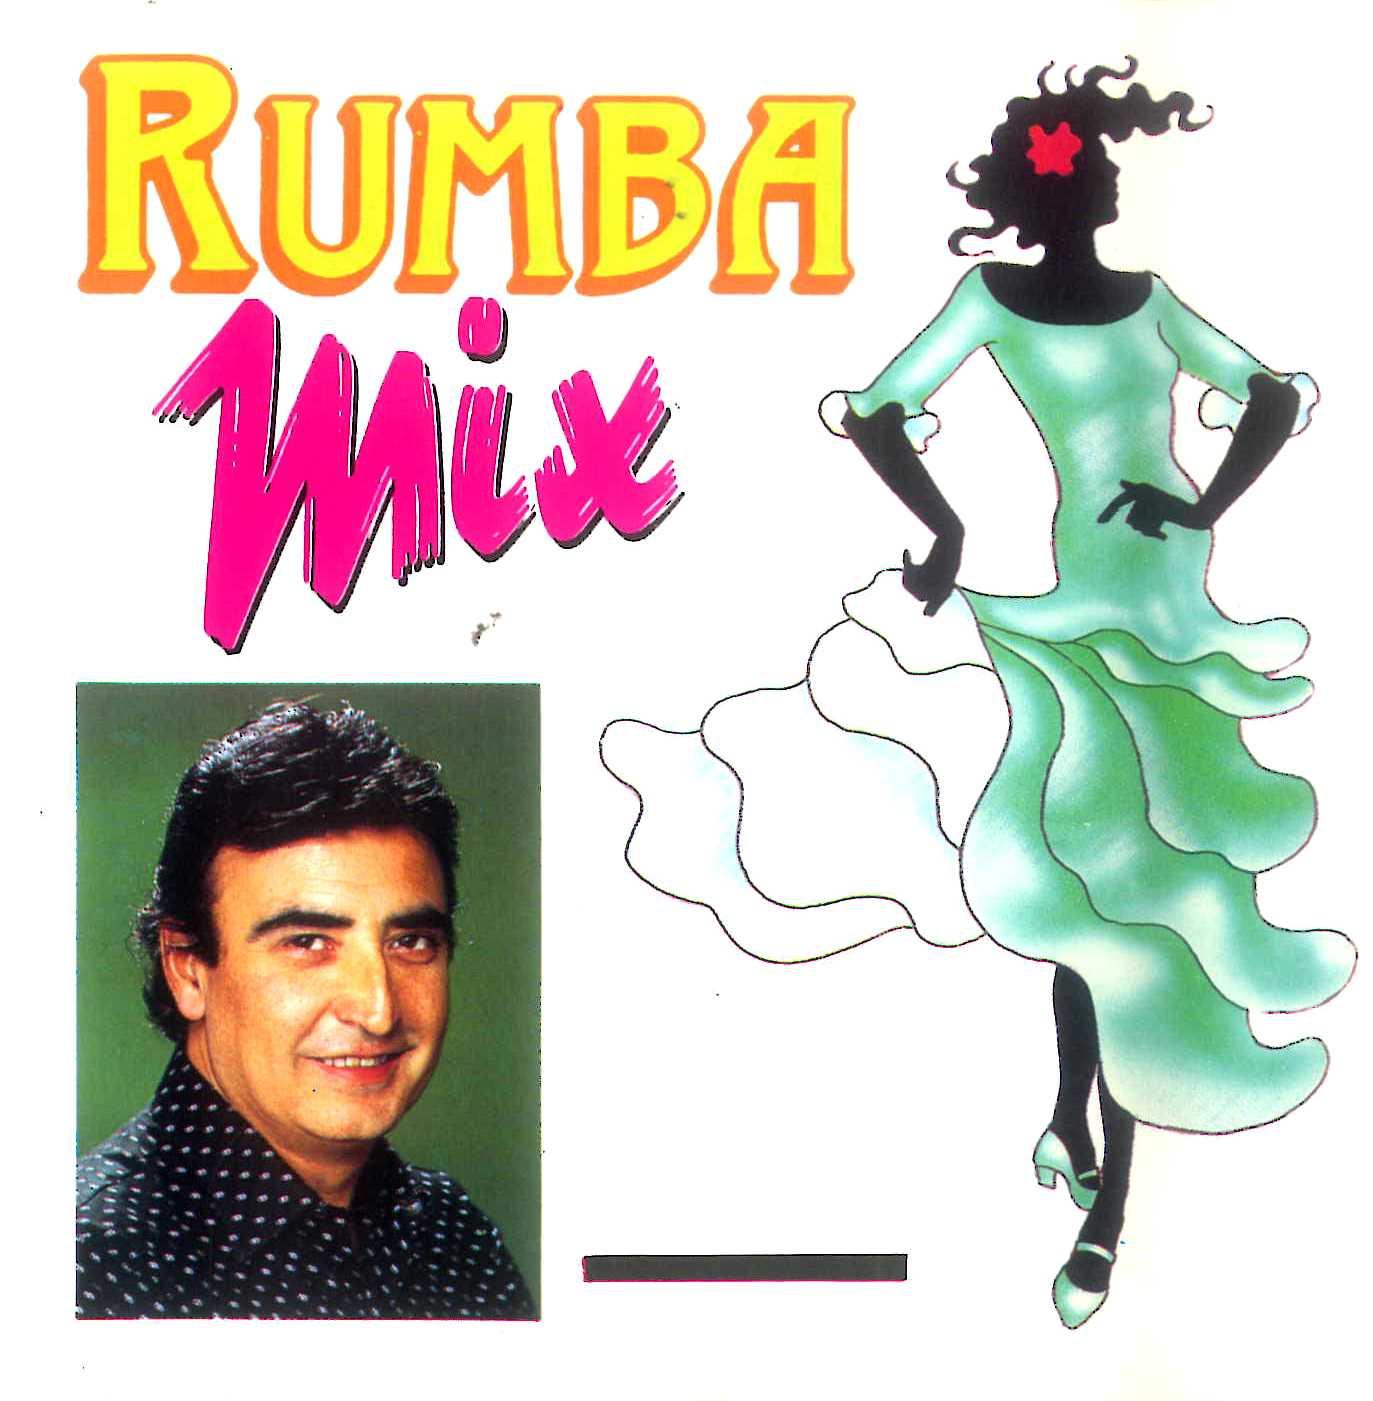 Rumba mix